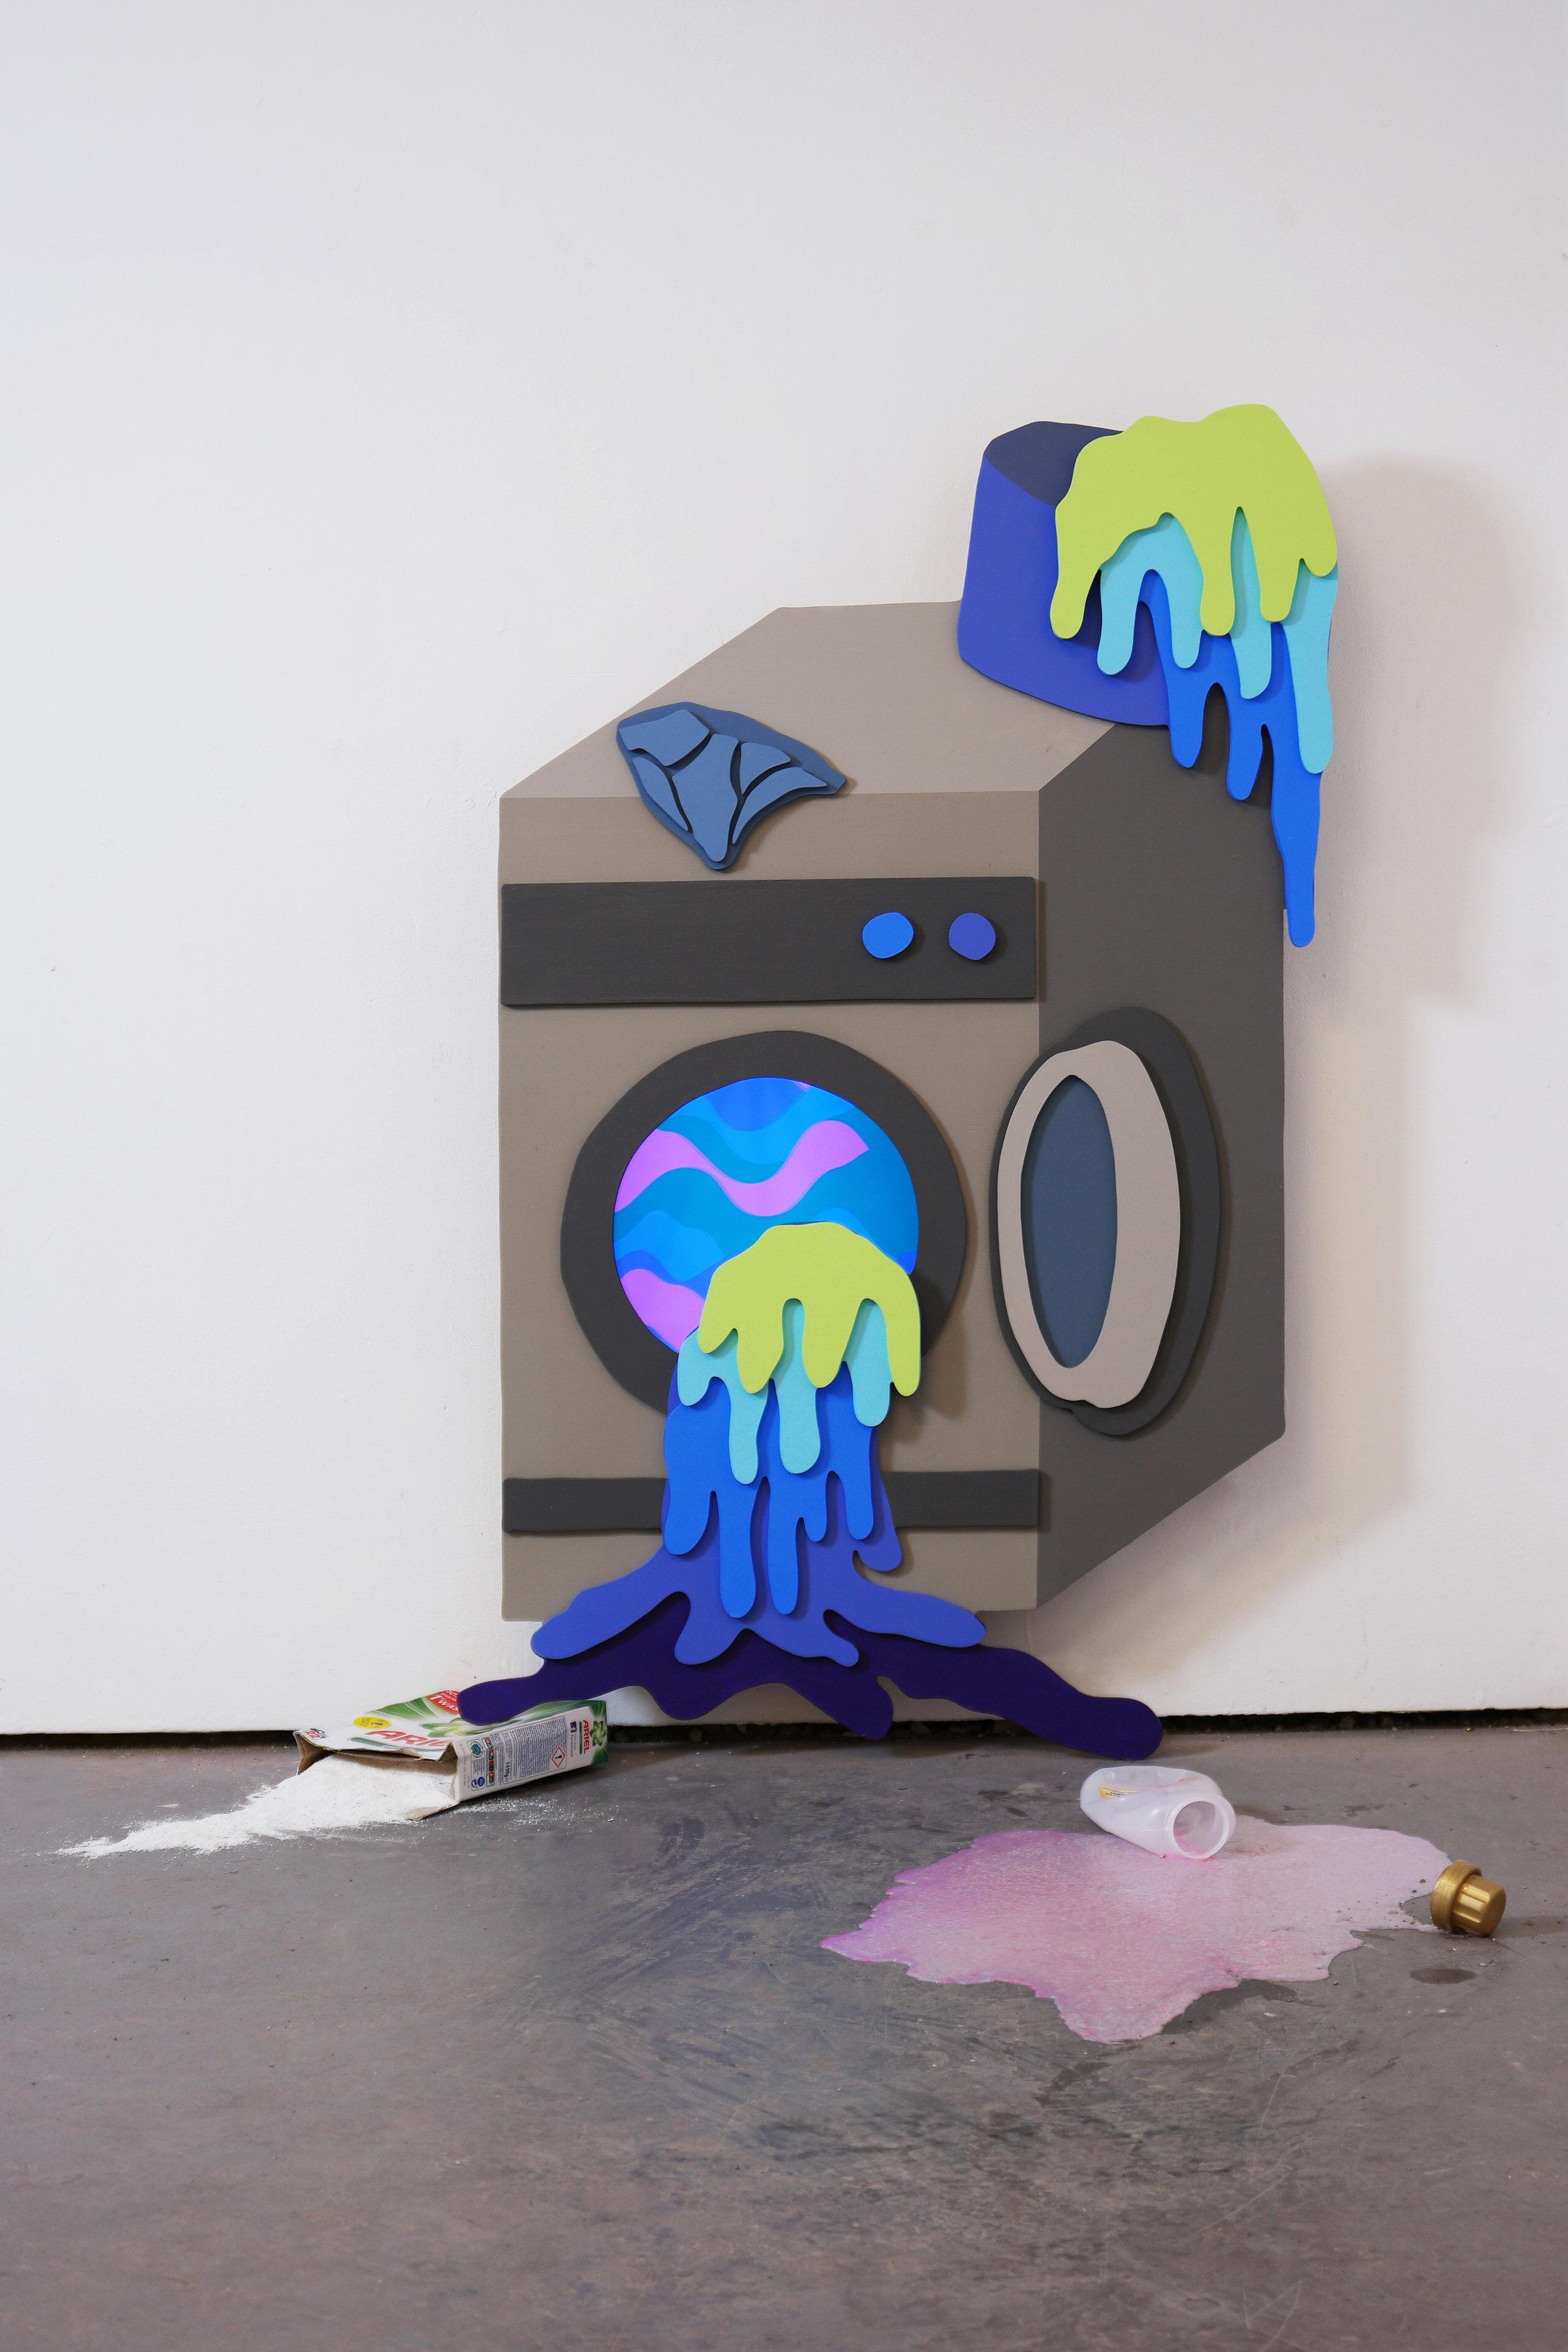 'I Don't Want To Do Laundry' (2018)